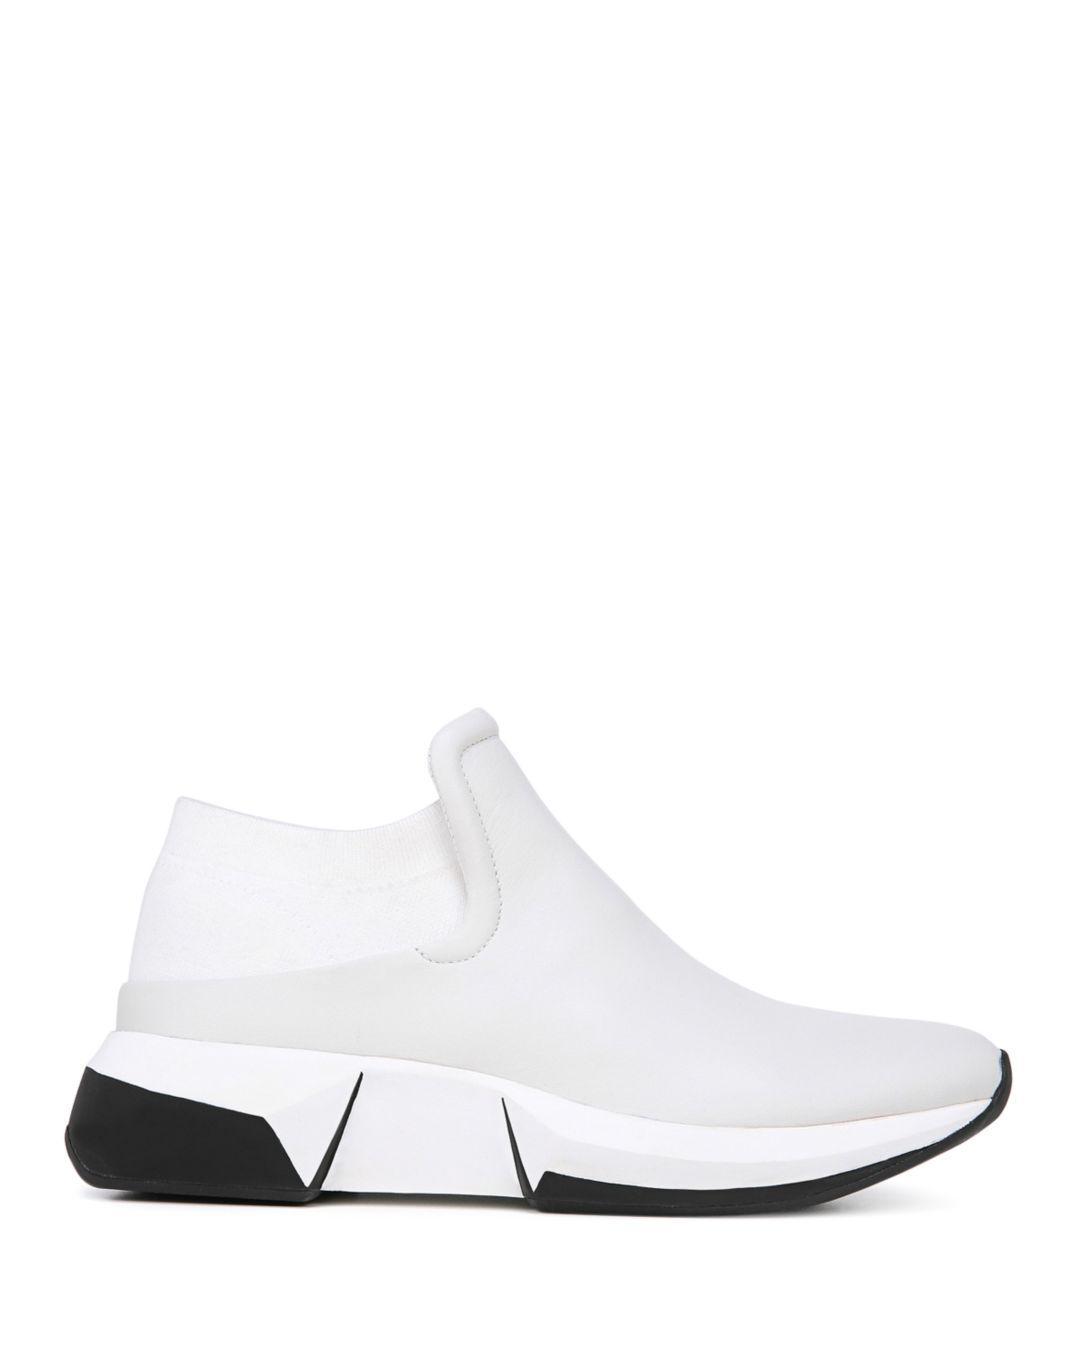 Via Spiga Veila Slip-on Sneaker in